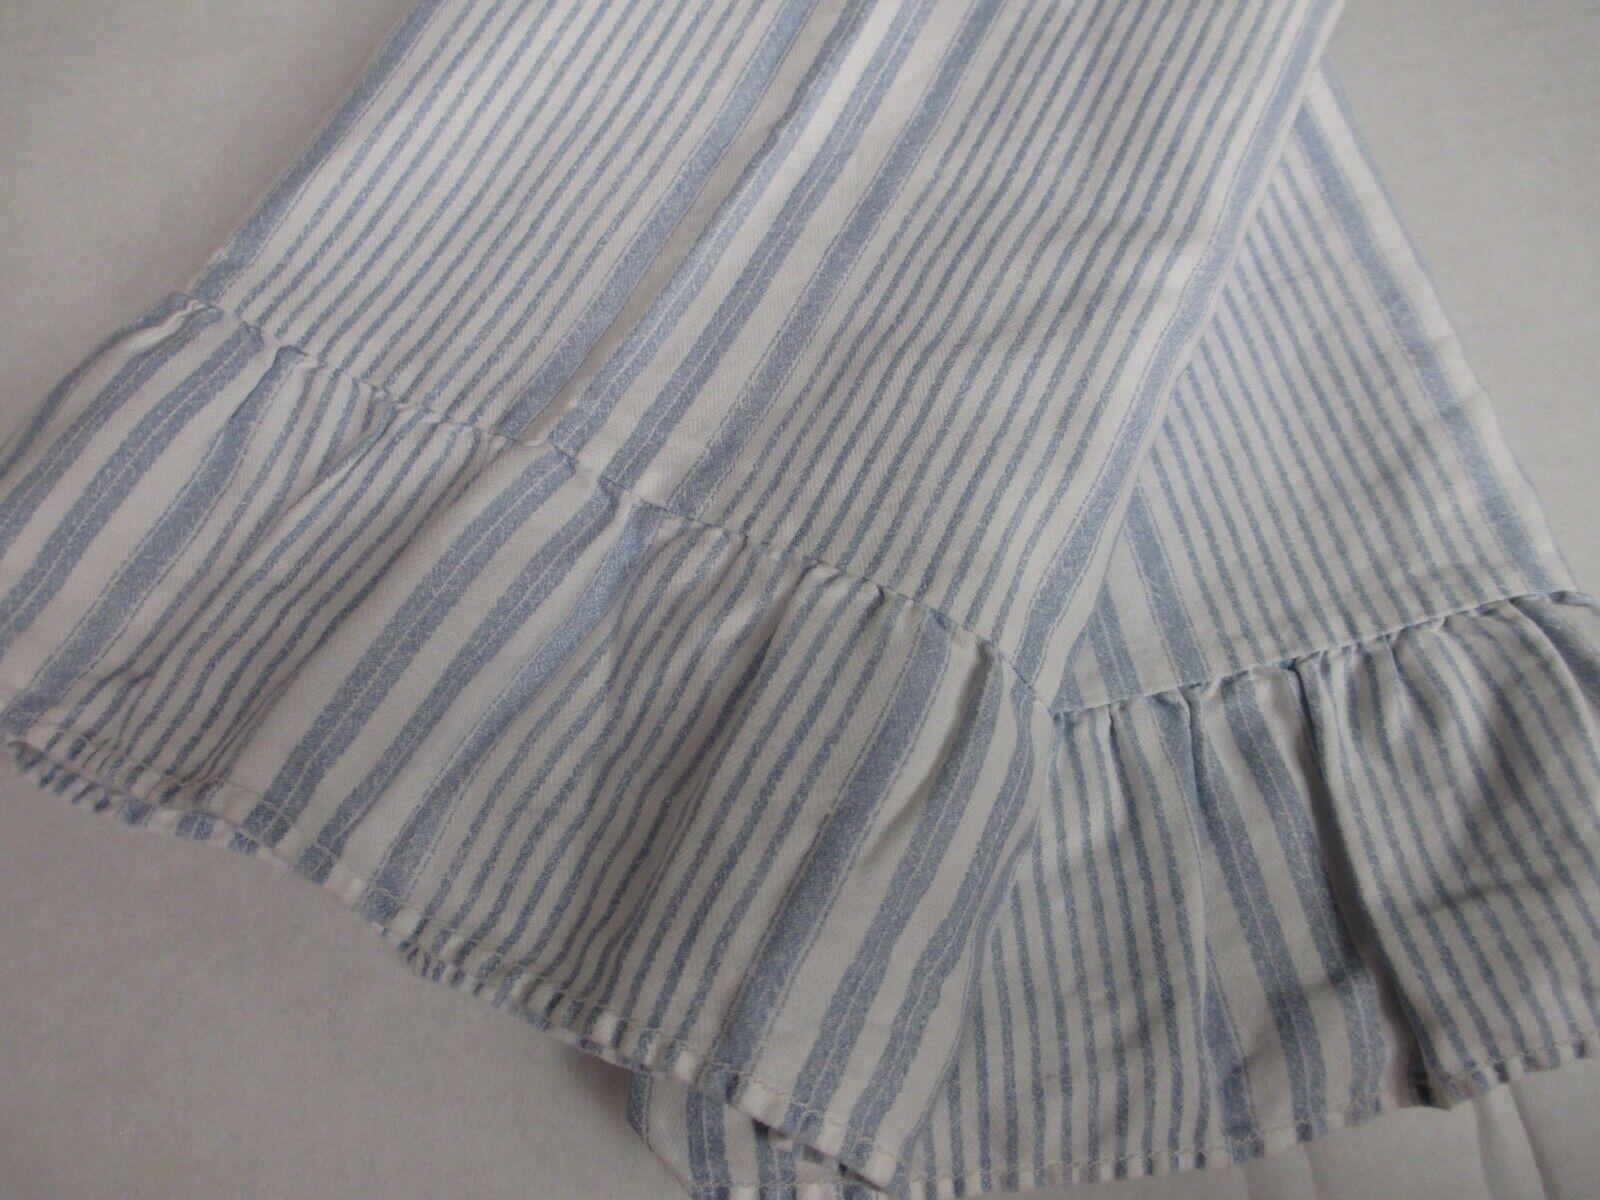 Ralph Lauren SHELTER ISLAND Weiß Blau Striped 2 Ruffled King Pillowcases